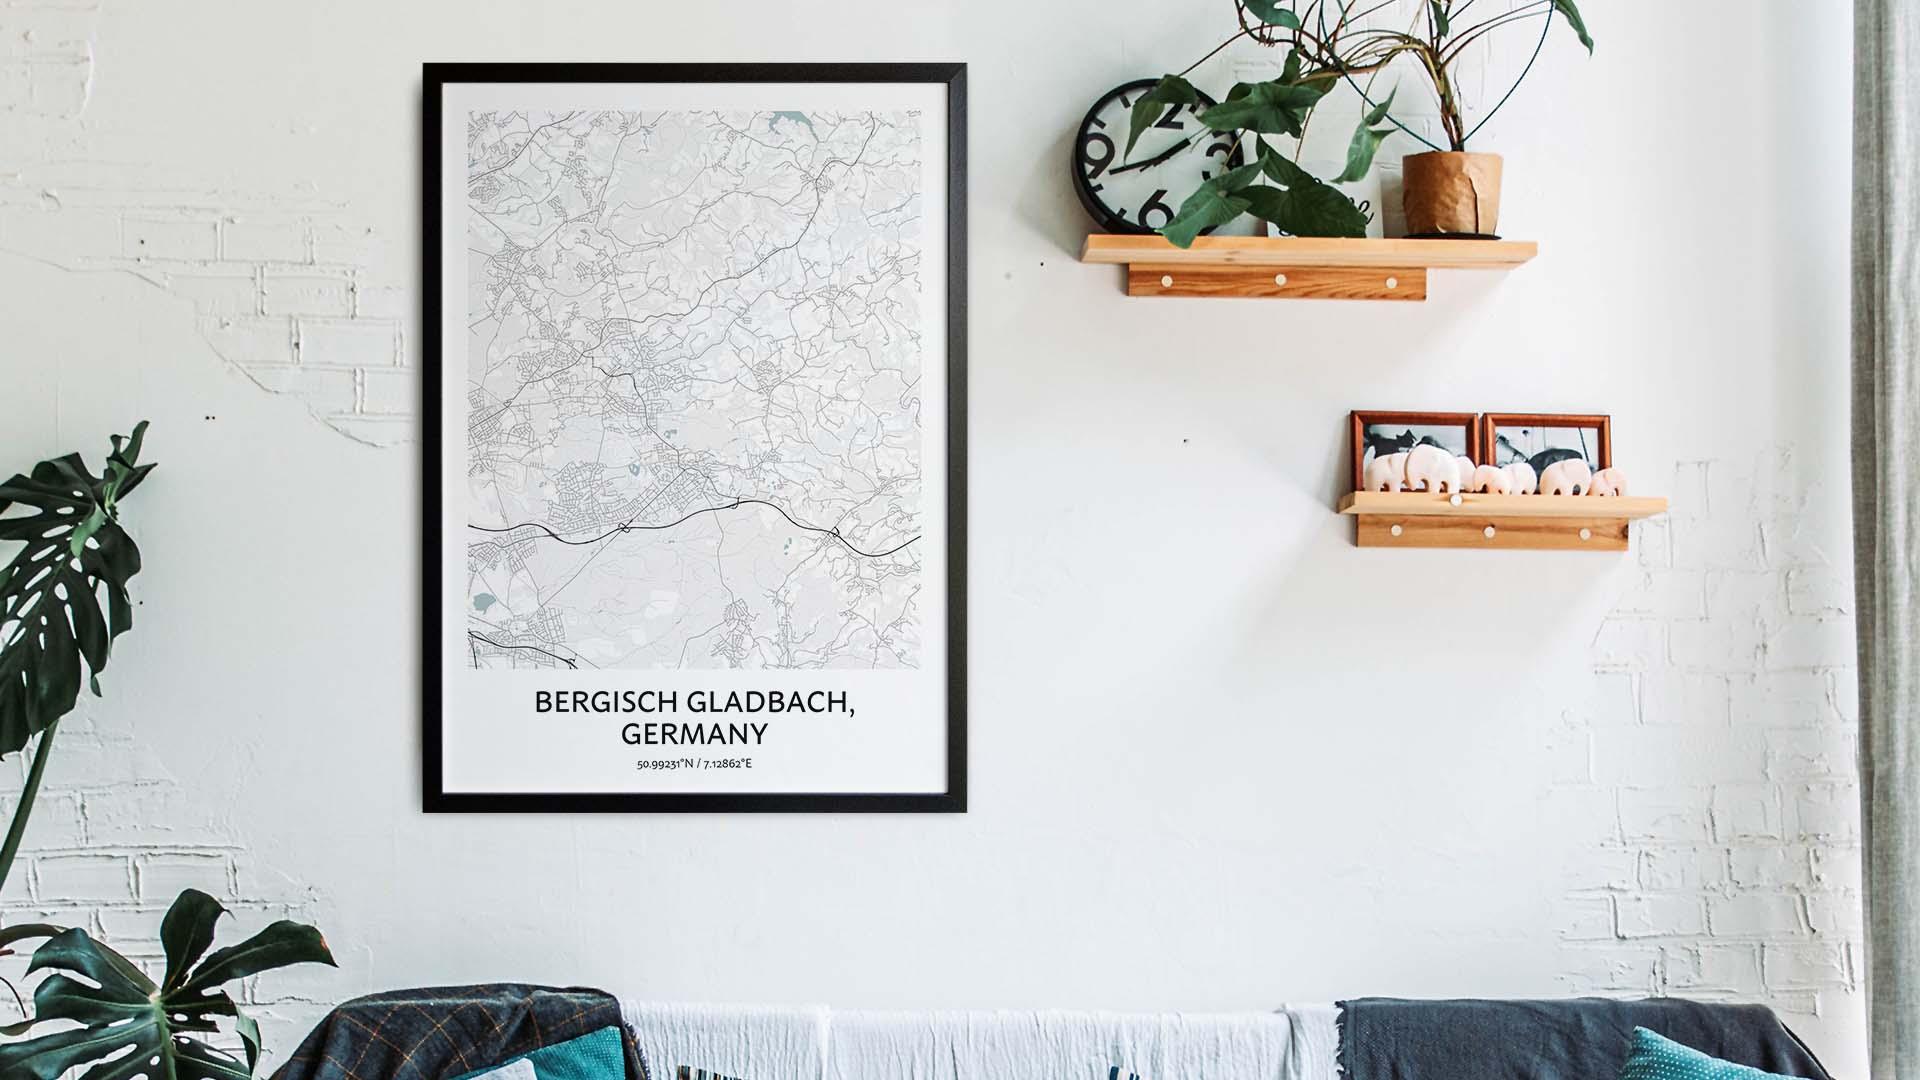 Bergisch Gladbach map art